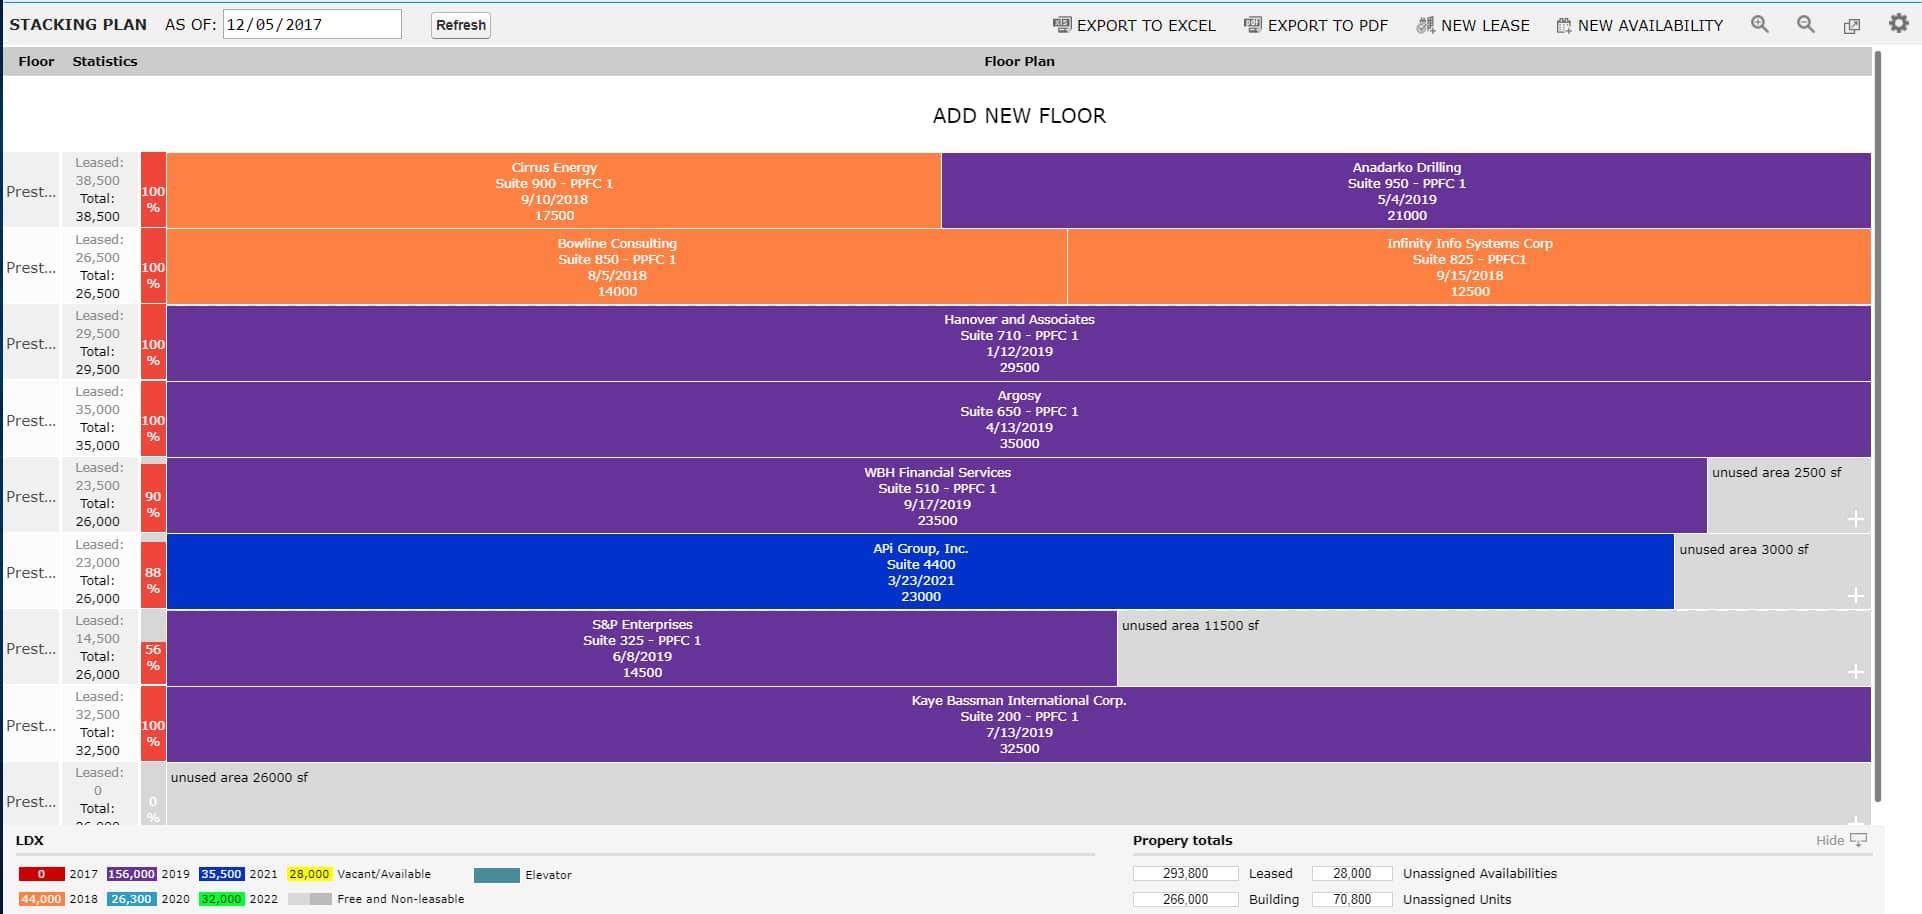 AscendixRE-CRM-Stacking-Plan